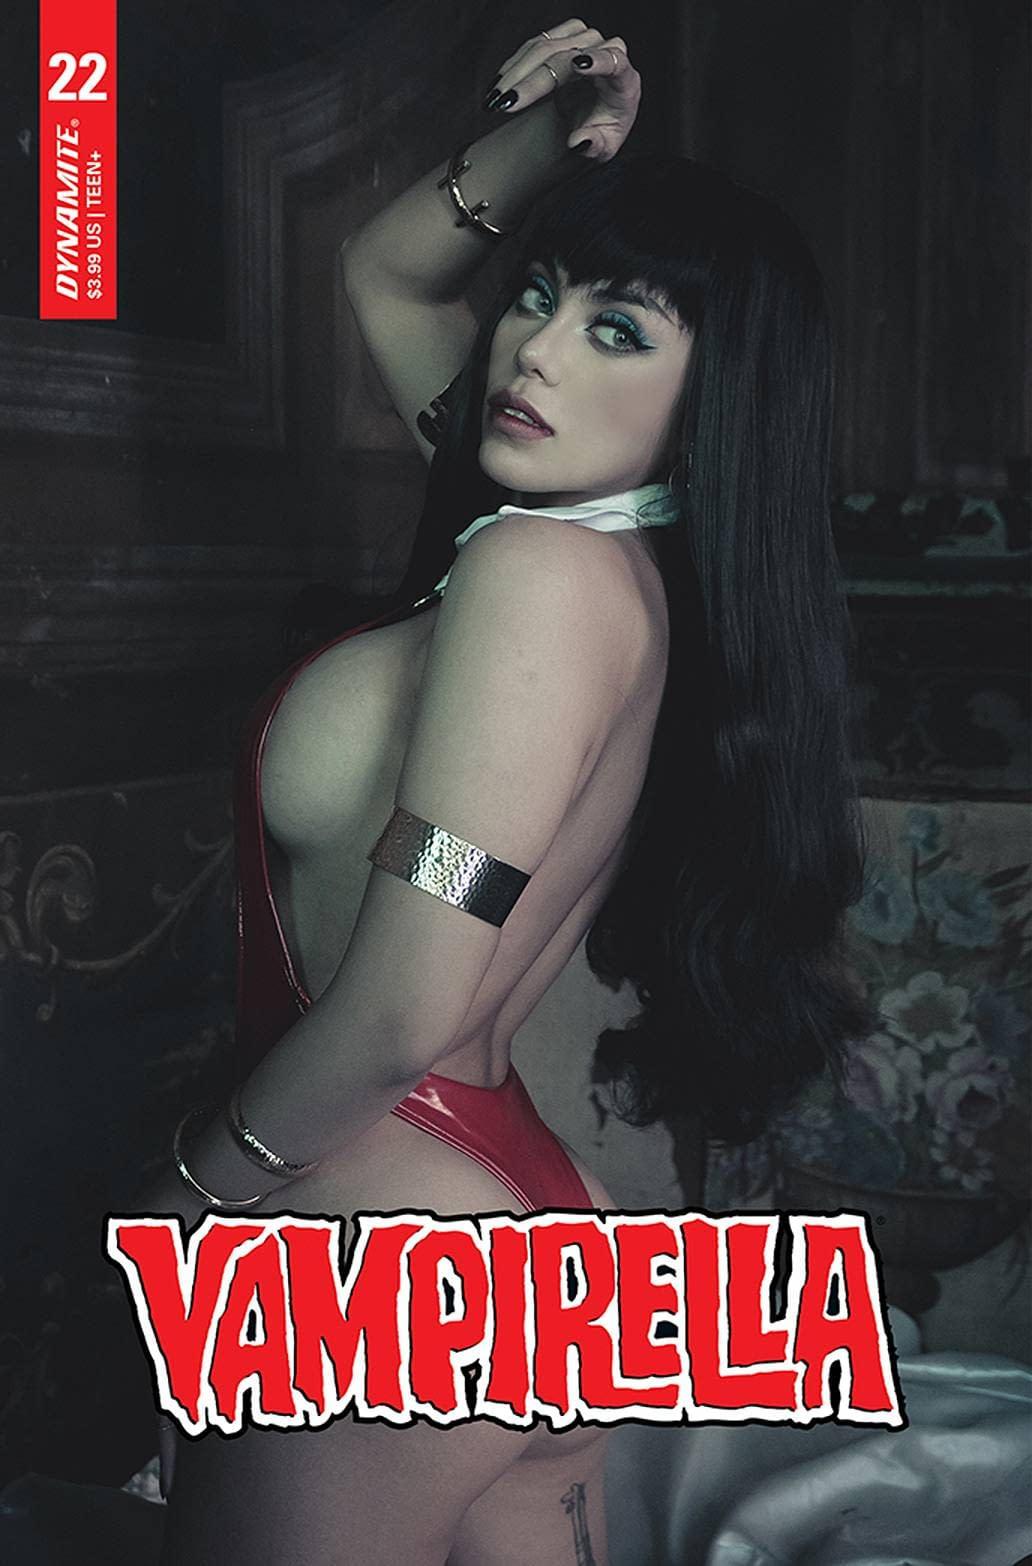 VAMPIRELLA #22 CVR E LORRAINE COSPLAY